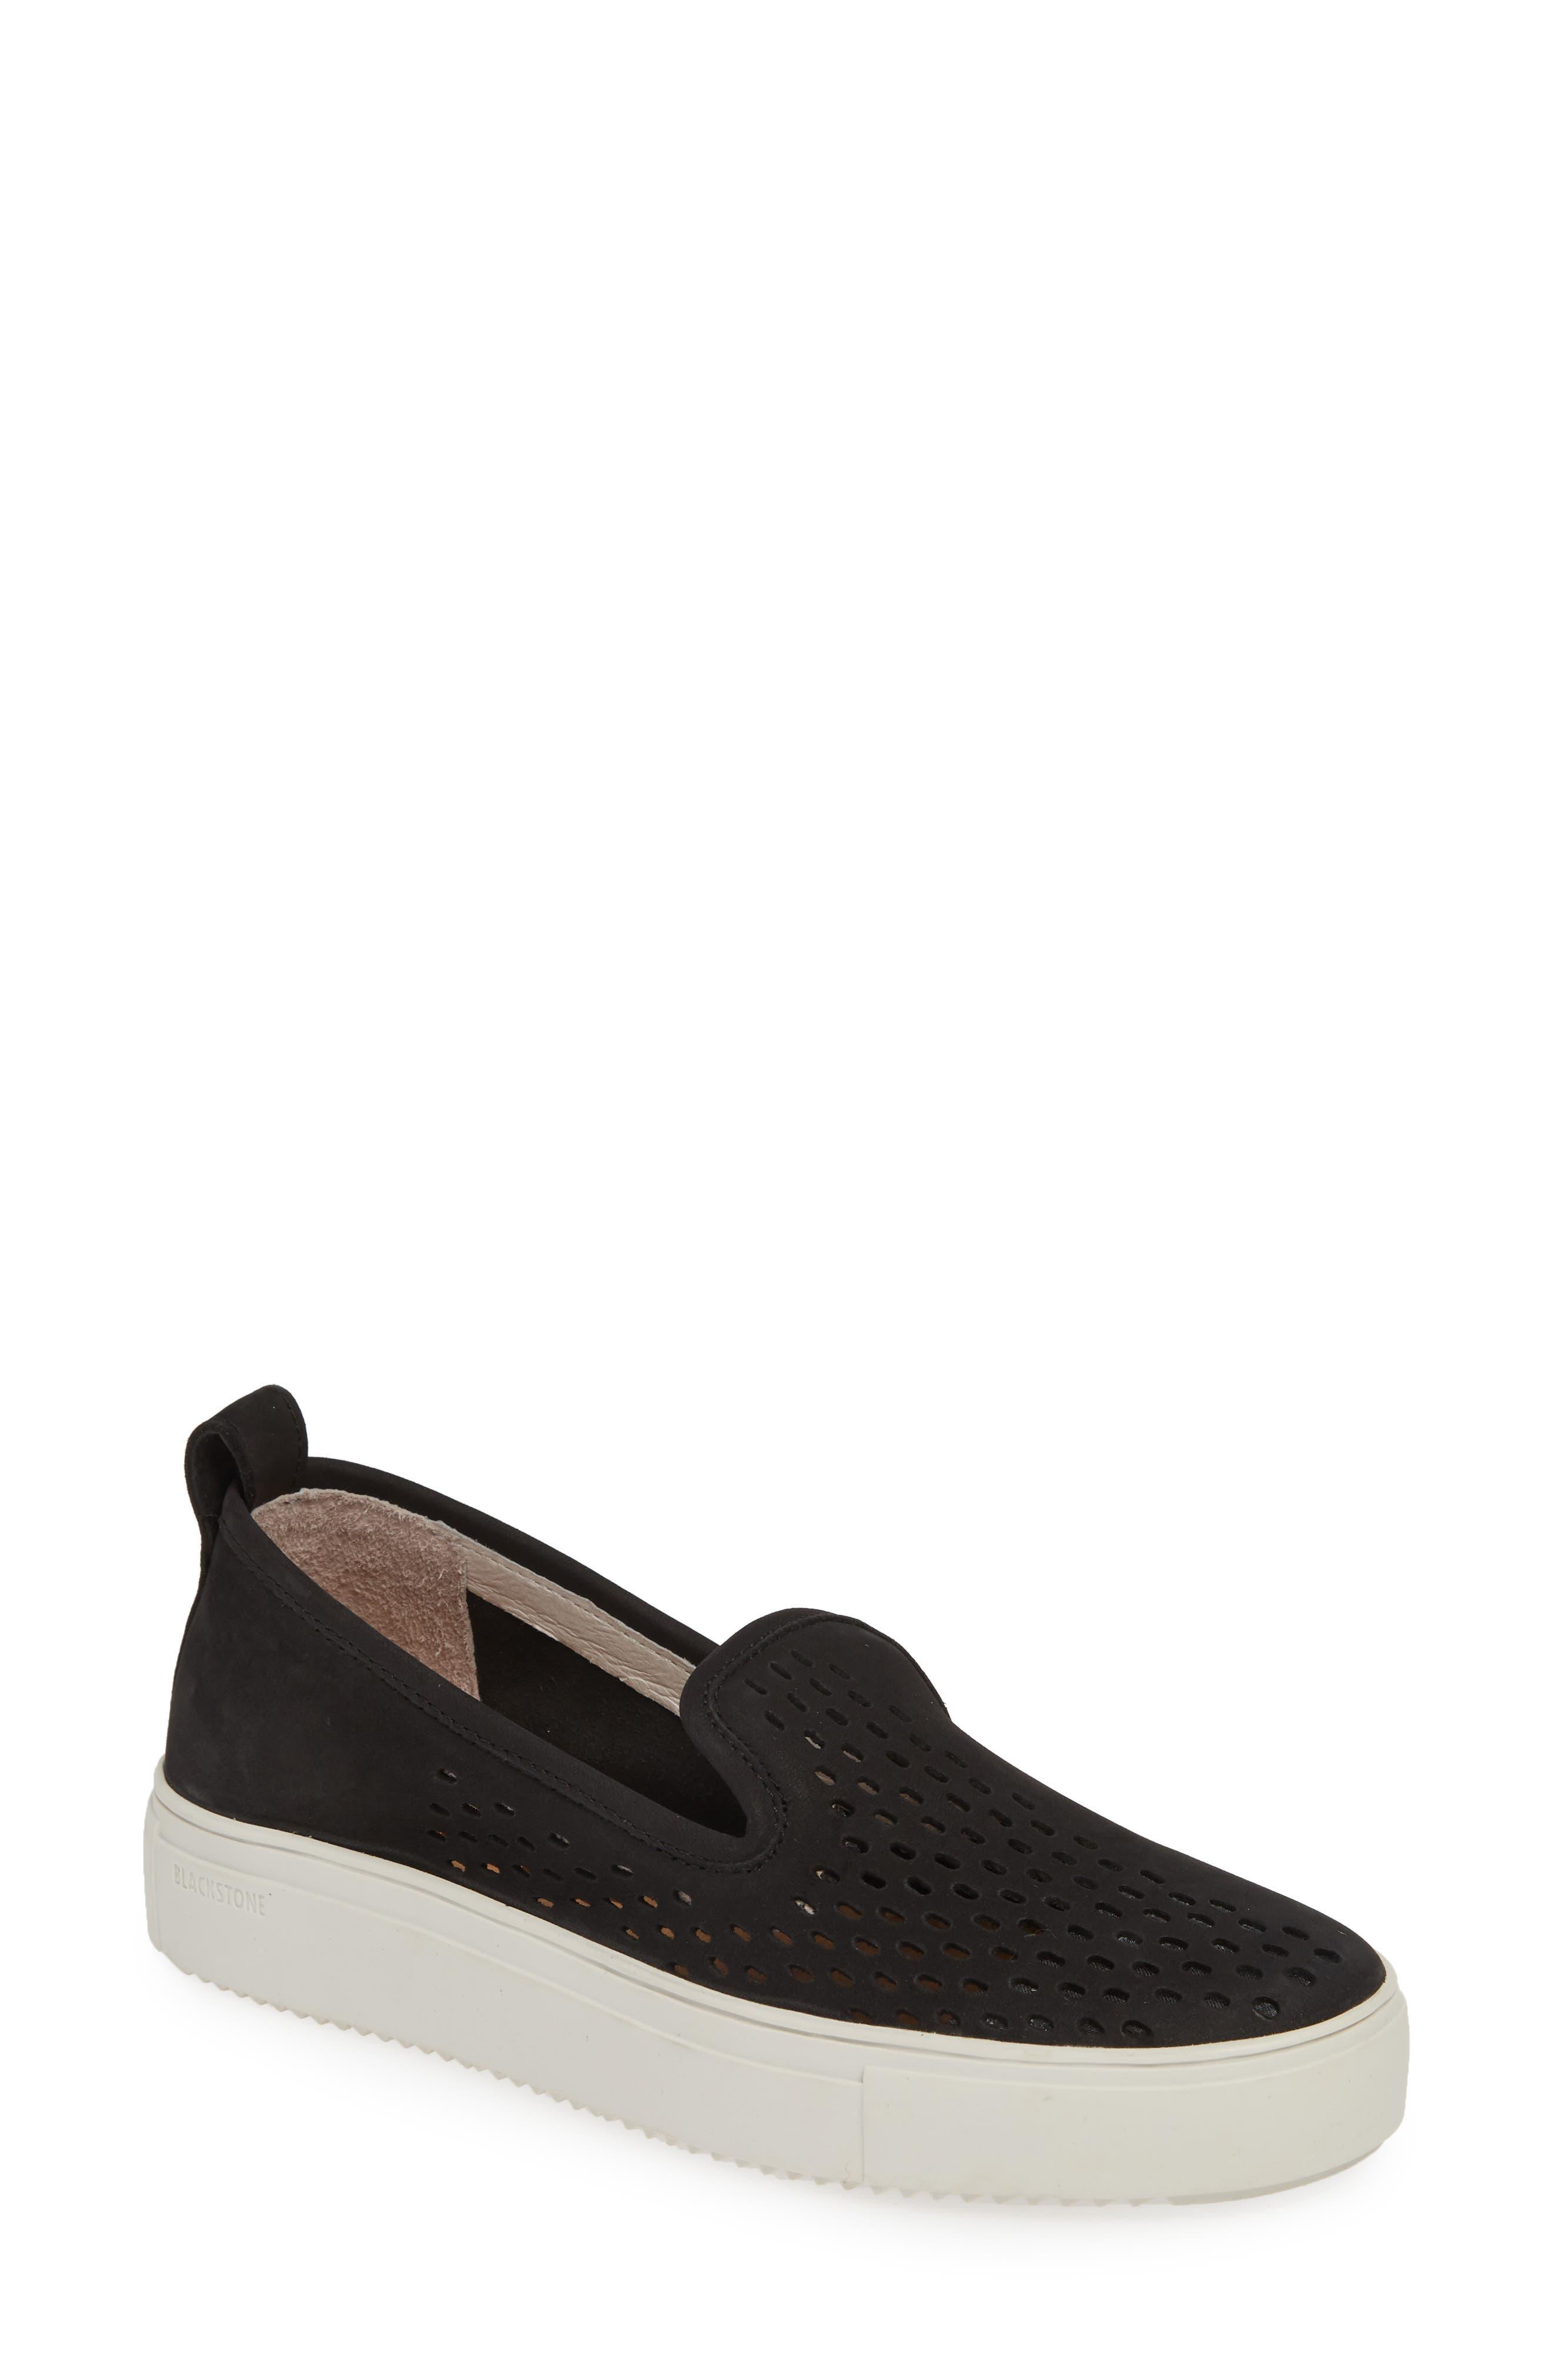 Blackstone Rl68 Perforated Slip-On Sneaker, Black